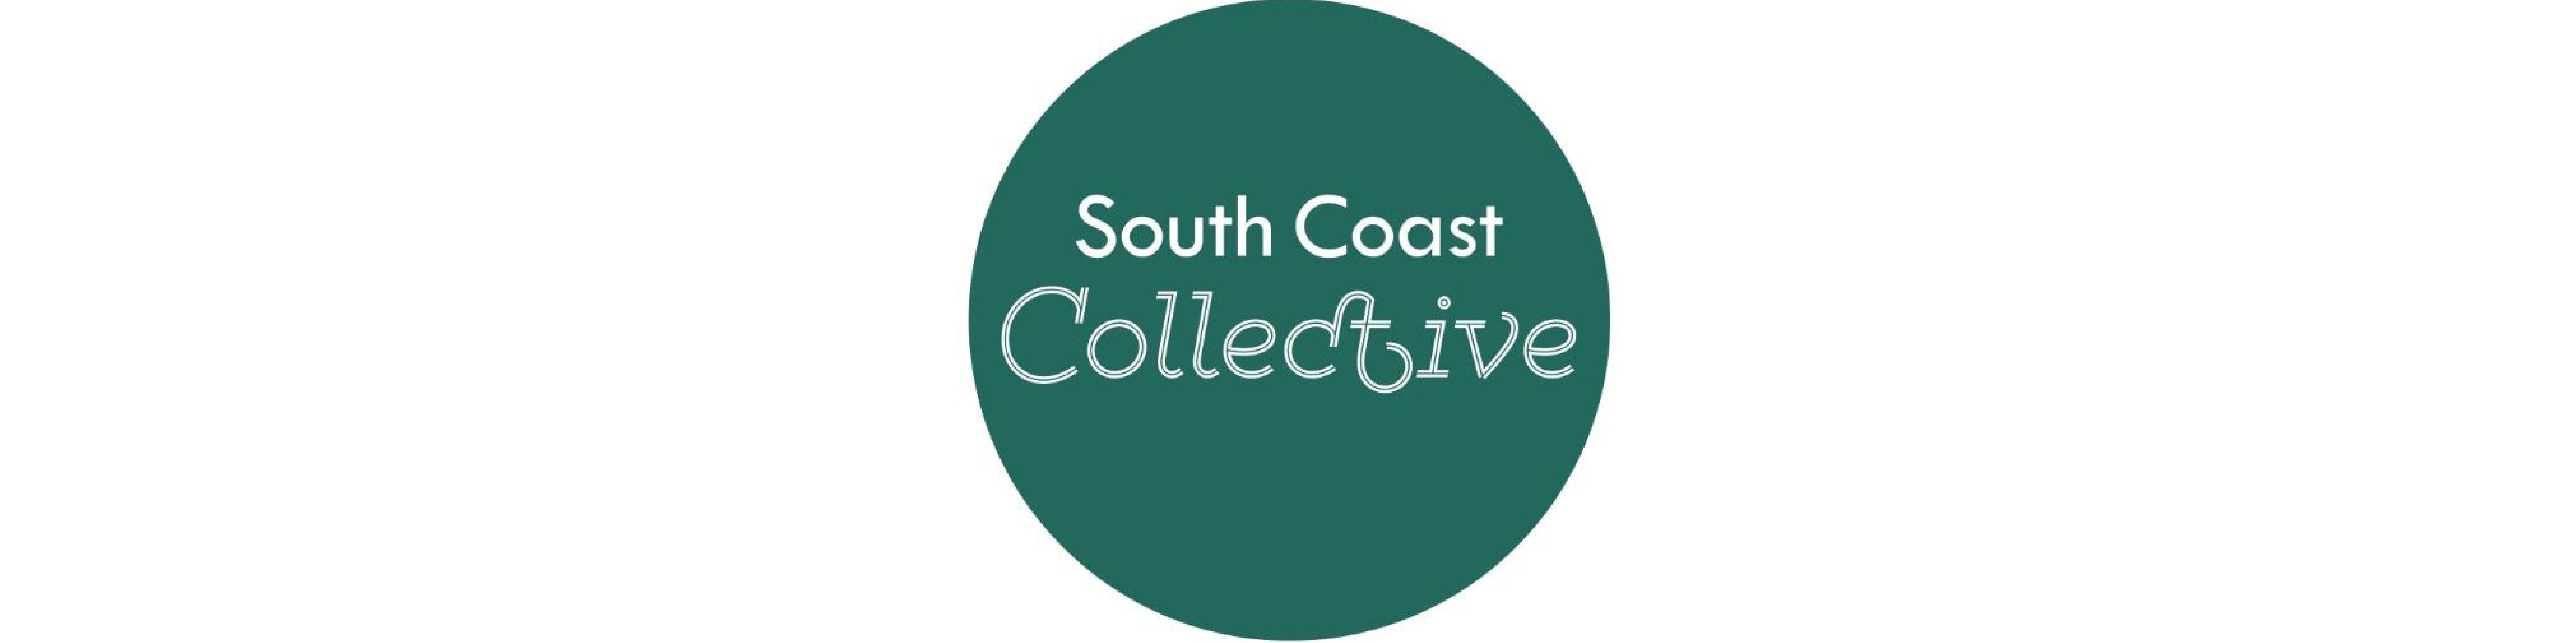 South Coast Collective